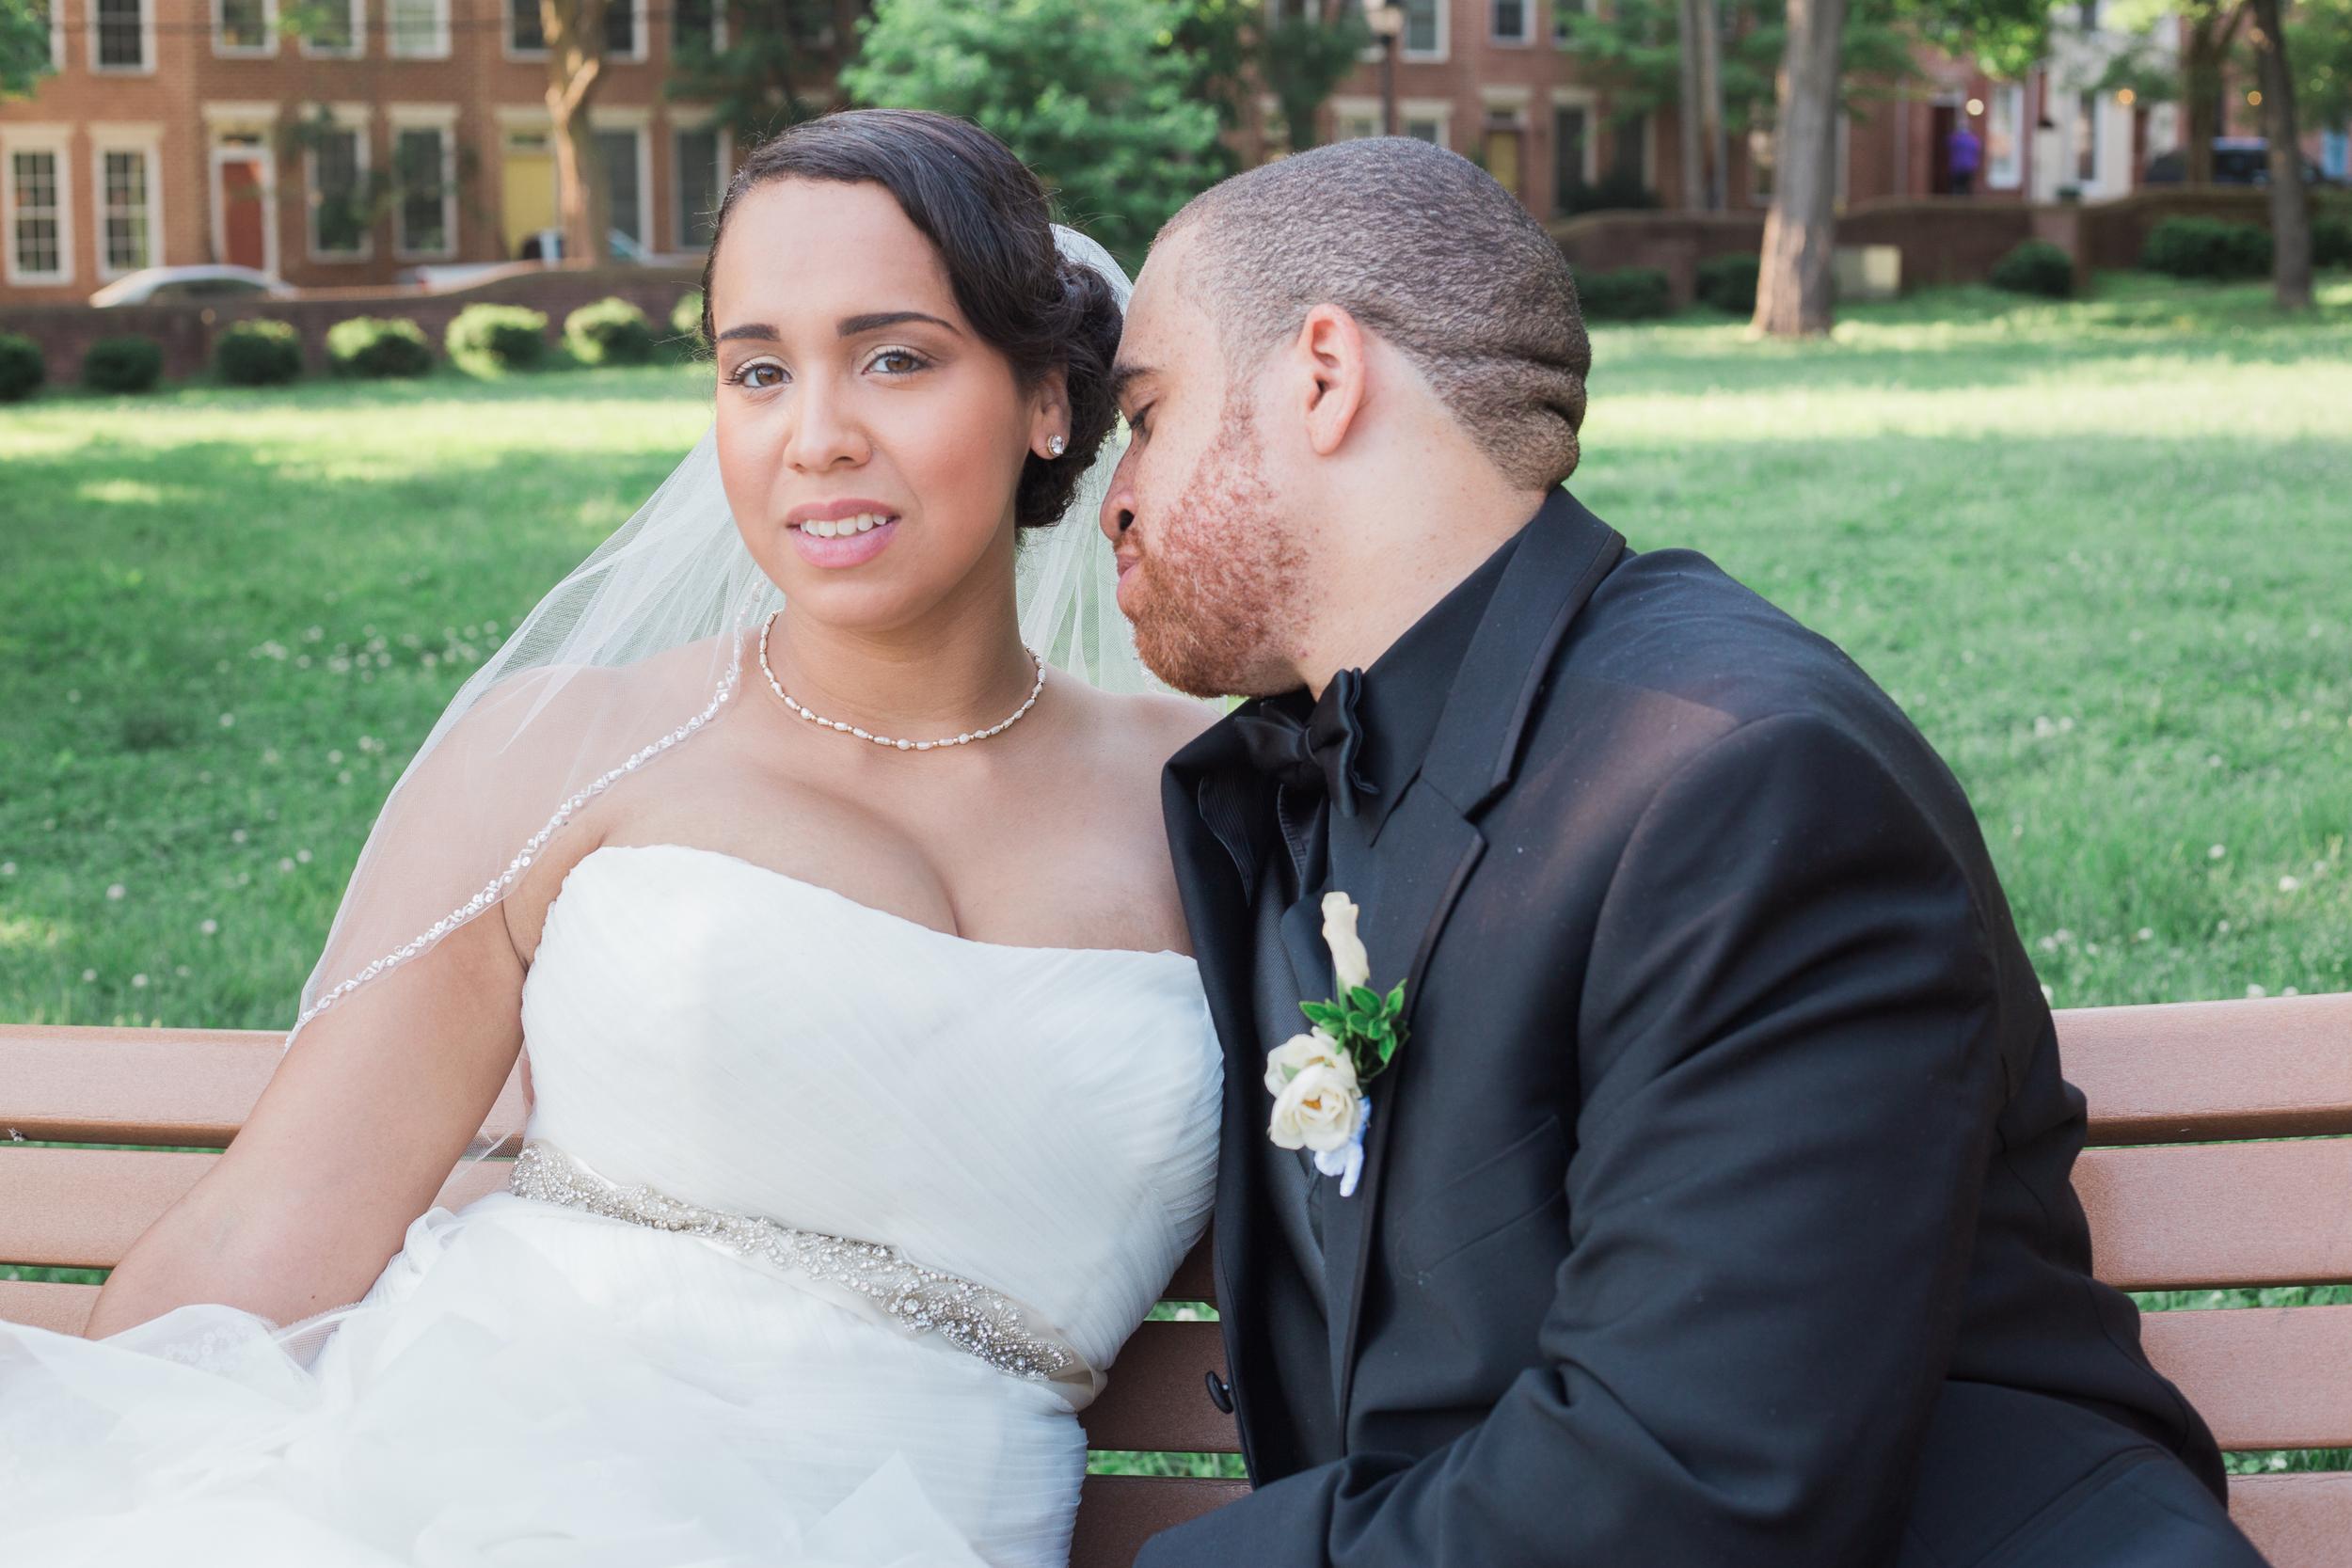 Eubie Blake Wedding-13.jpg